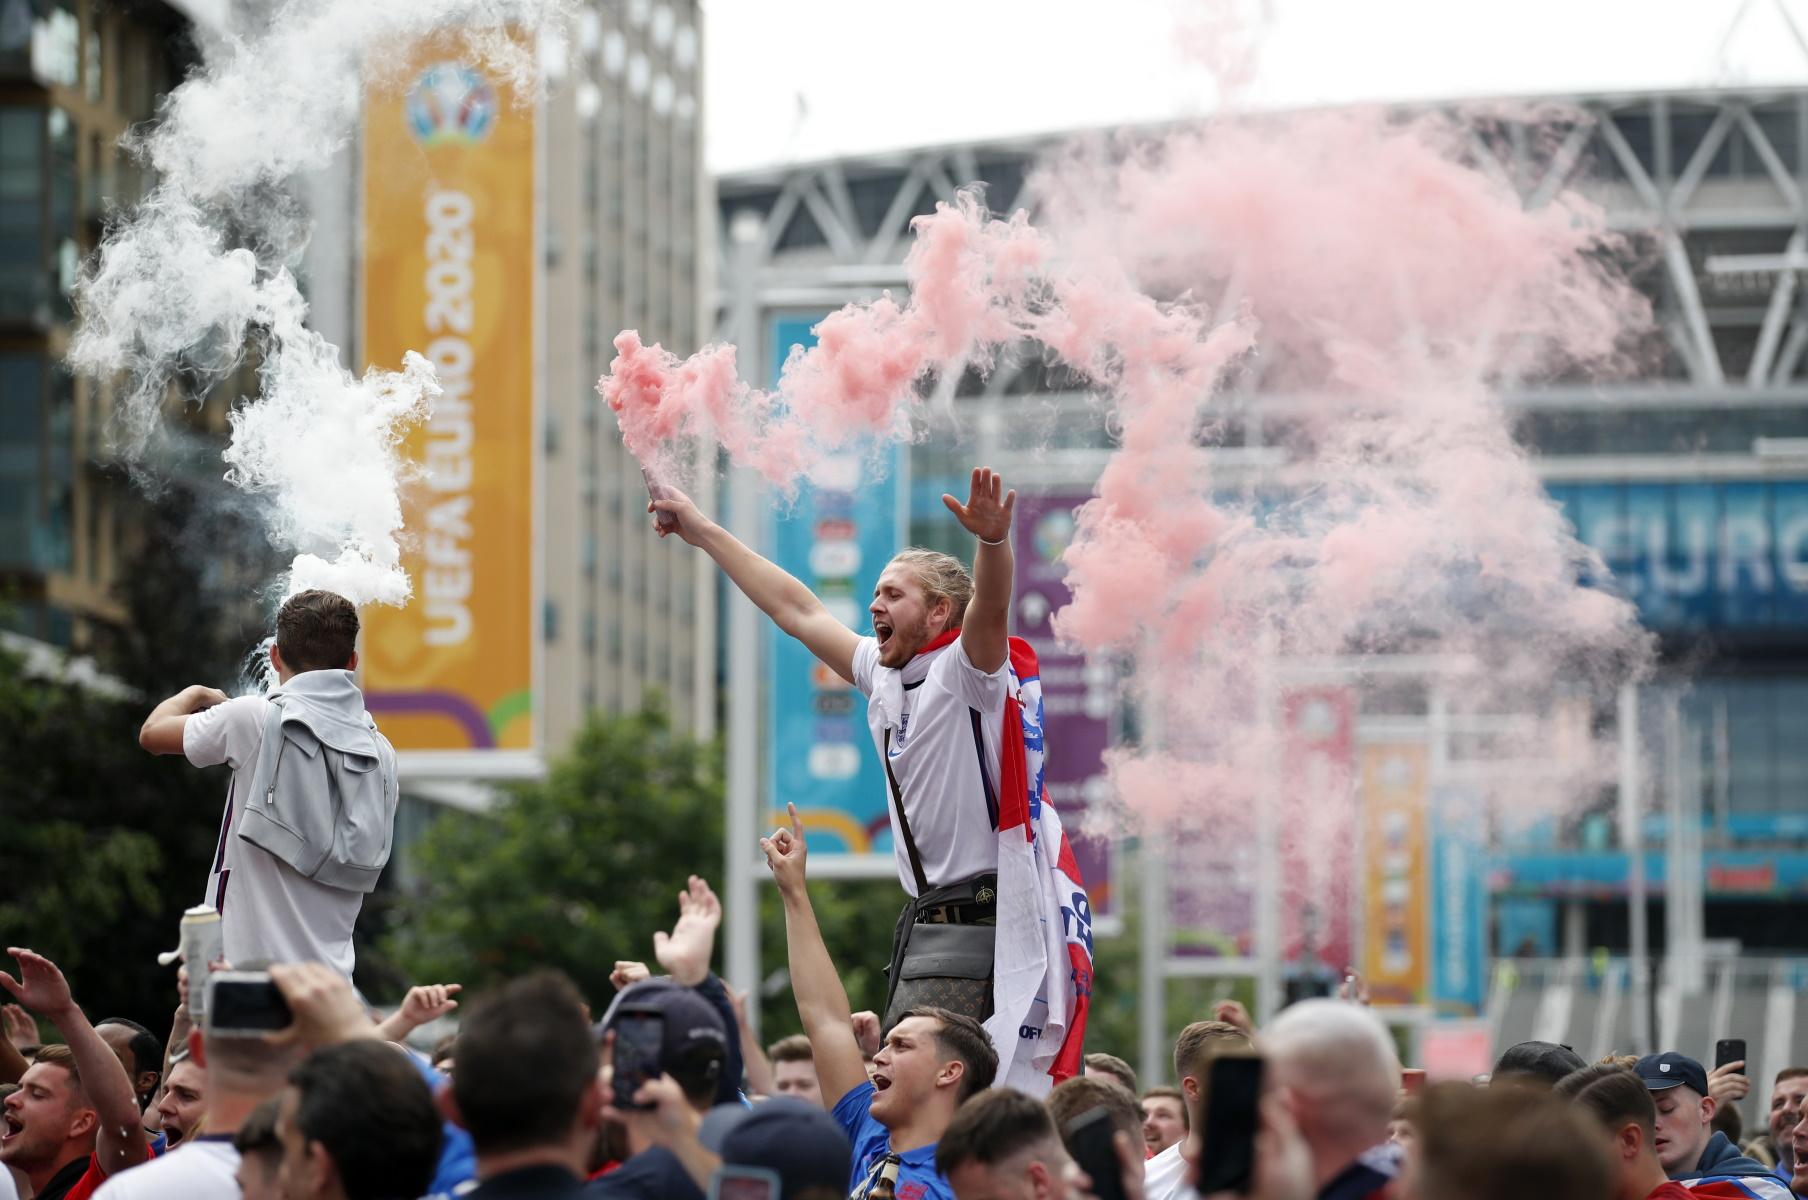 Euro 2020: Από το μεσημέρι στο Wembley – Ξεκίνησαν από νωρίς τις μπύρες